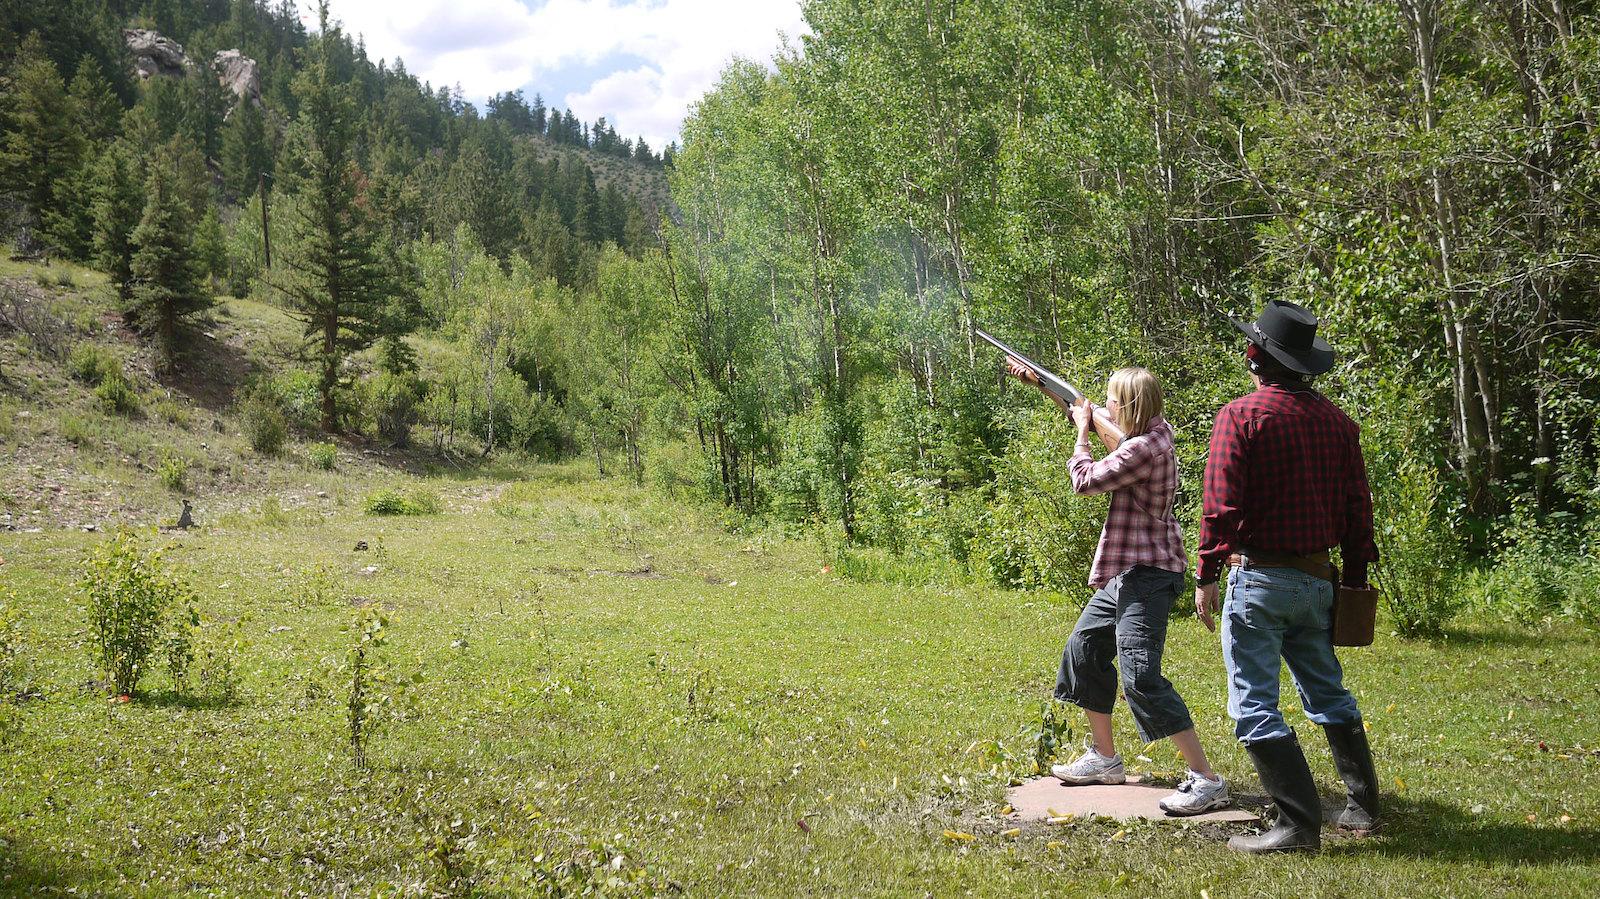 Image of a woman skeet shooting at Tumbling River Ranch in Grant, Colorado